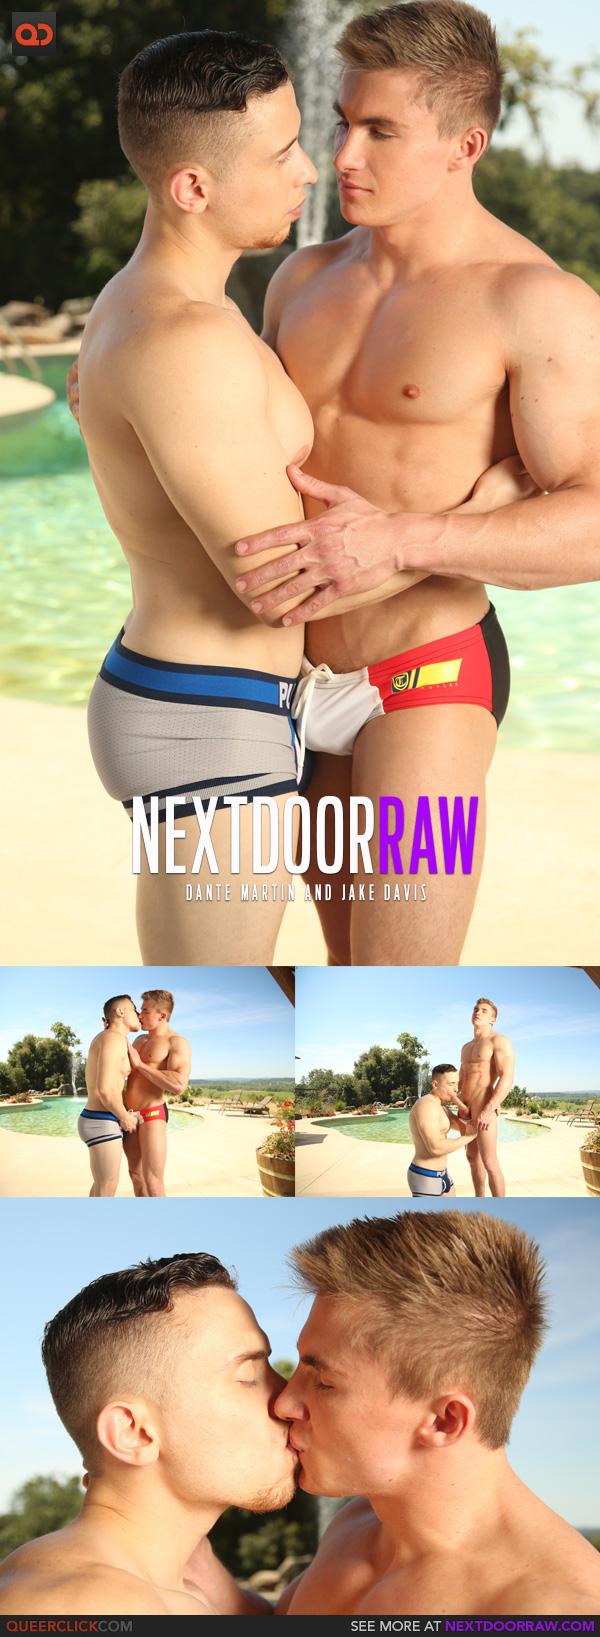 nextdoorraw-martin-davis